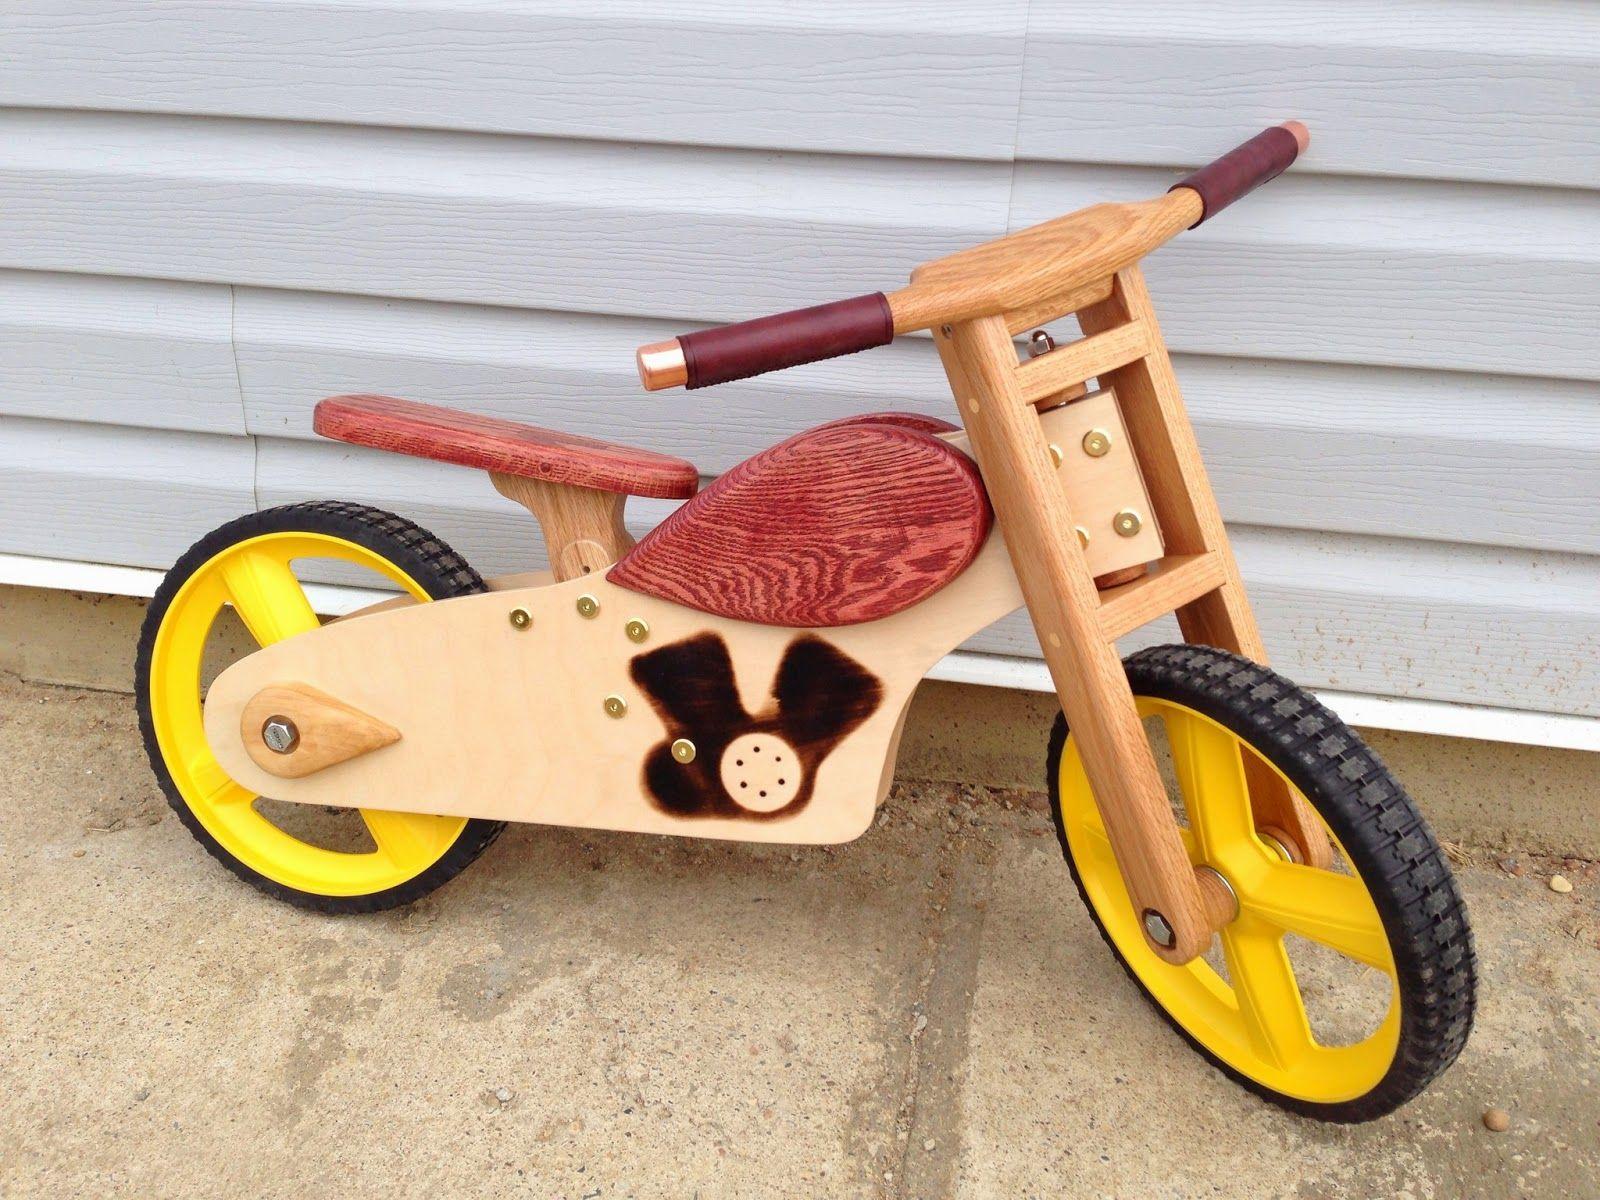 Wooden Push Bike Http Makeperday Blogspot Com 2013 05